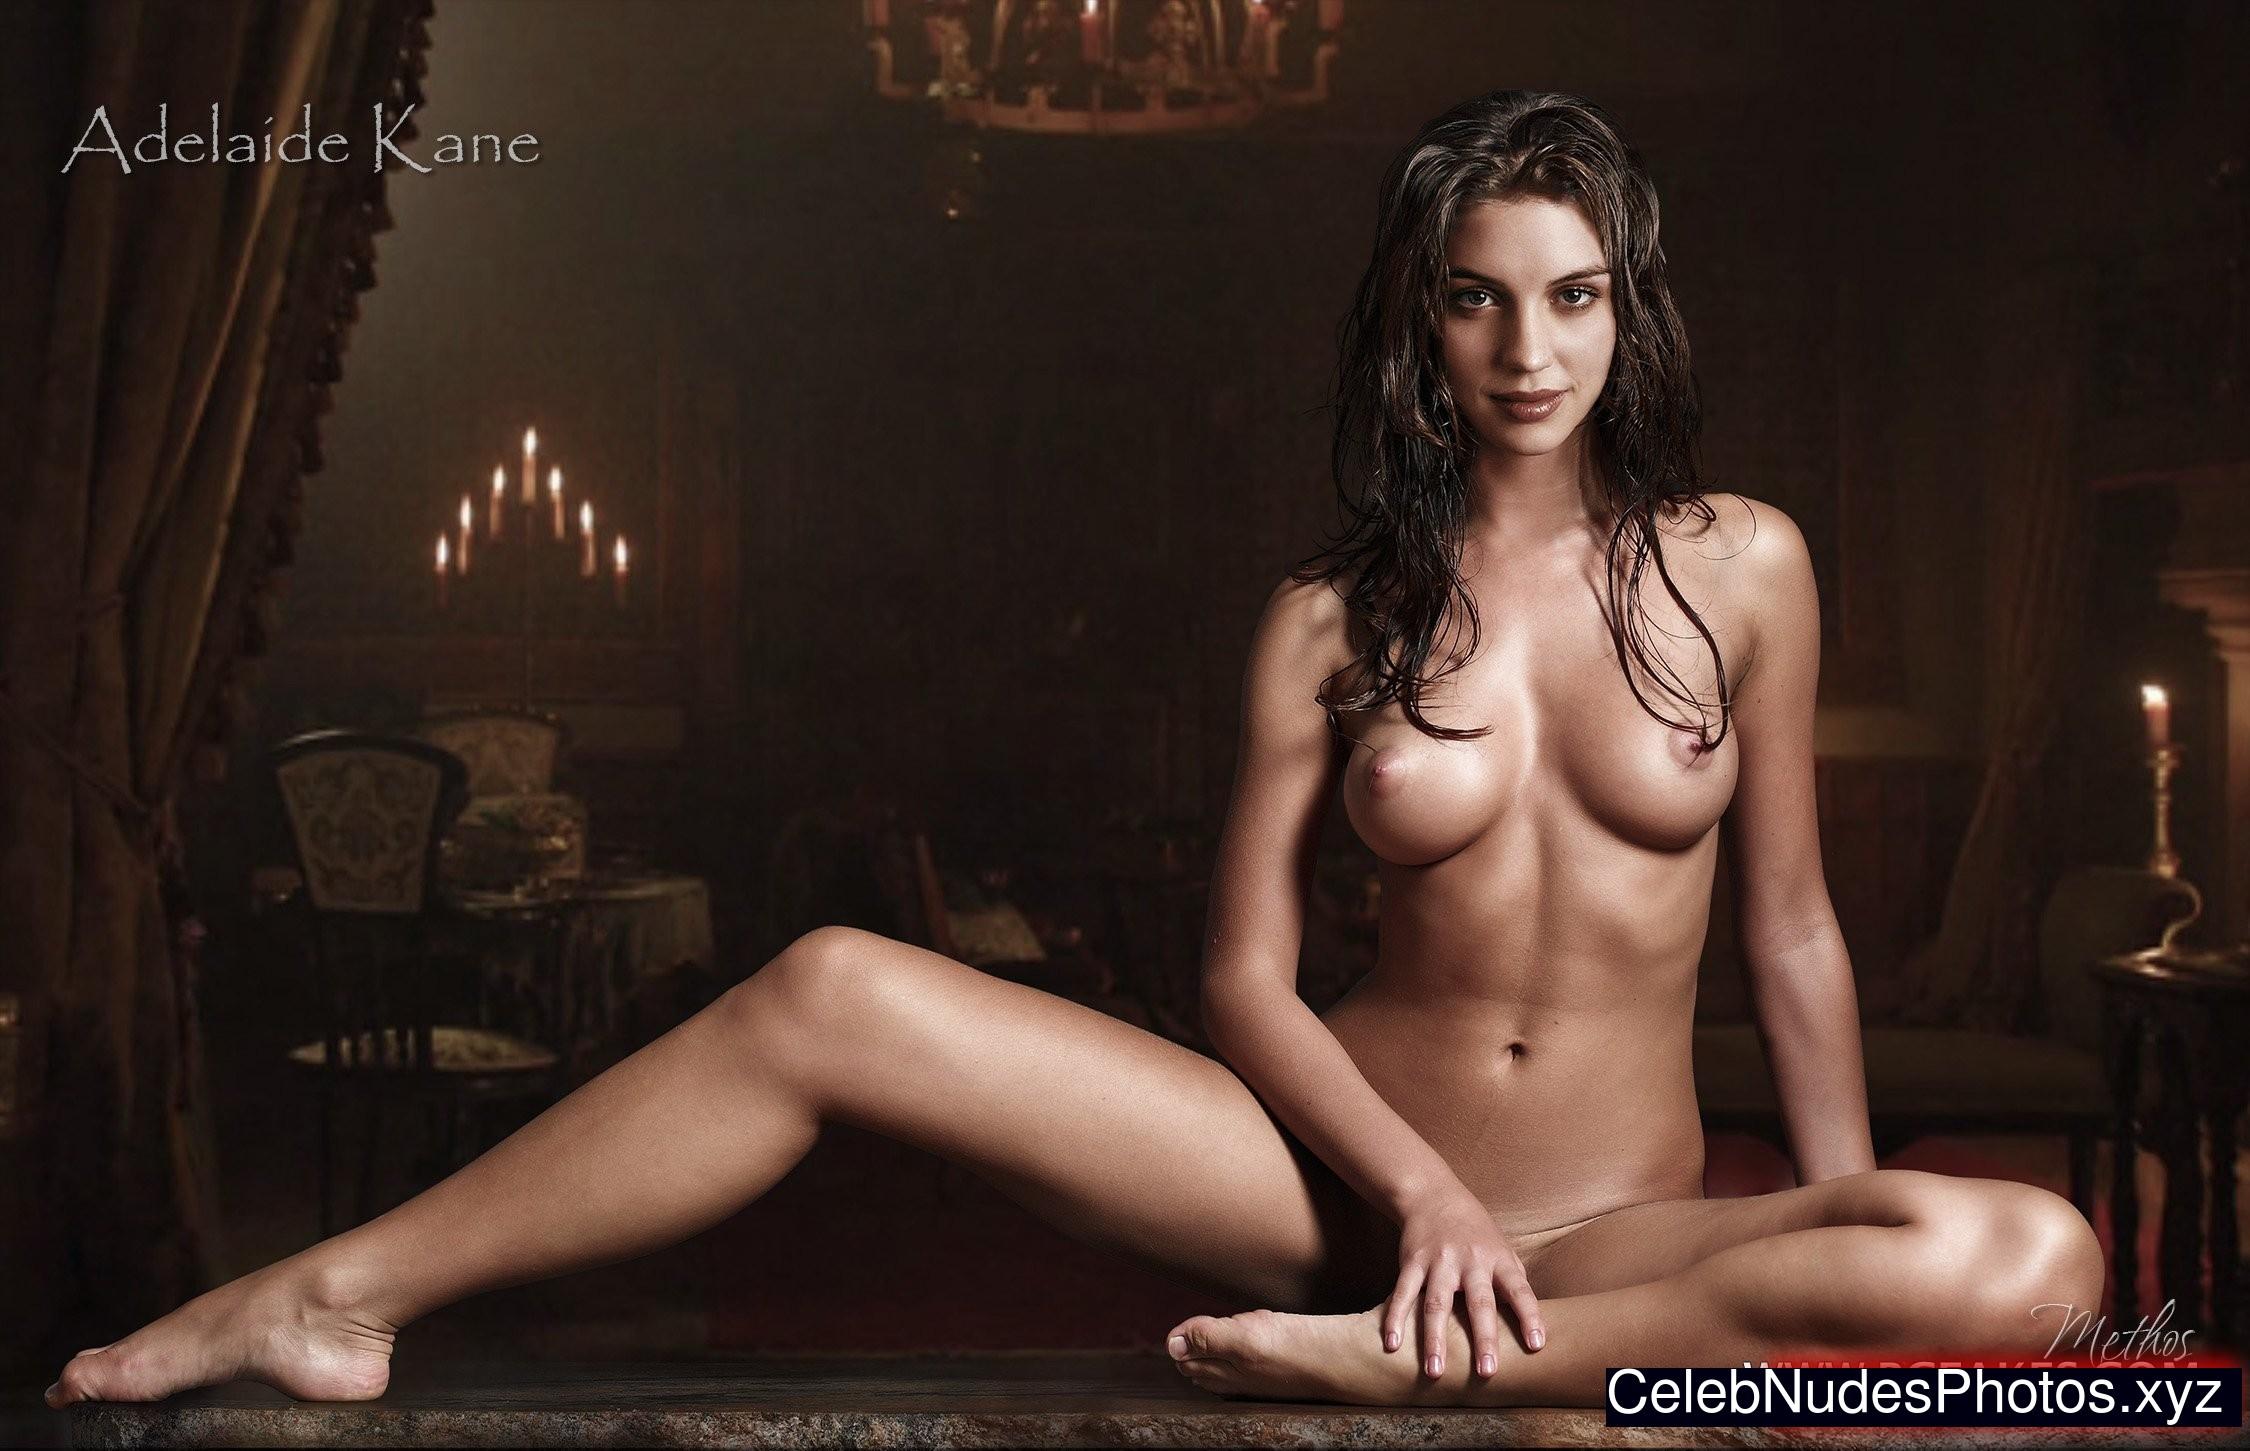 Adelaide Kane free nude celebrities